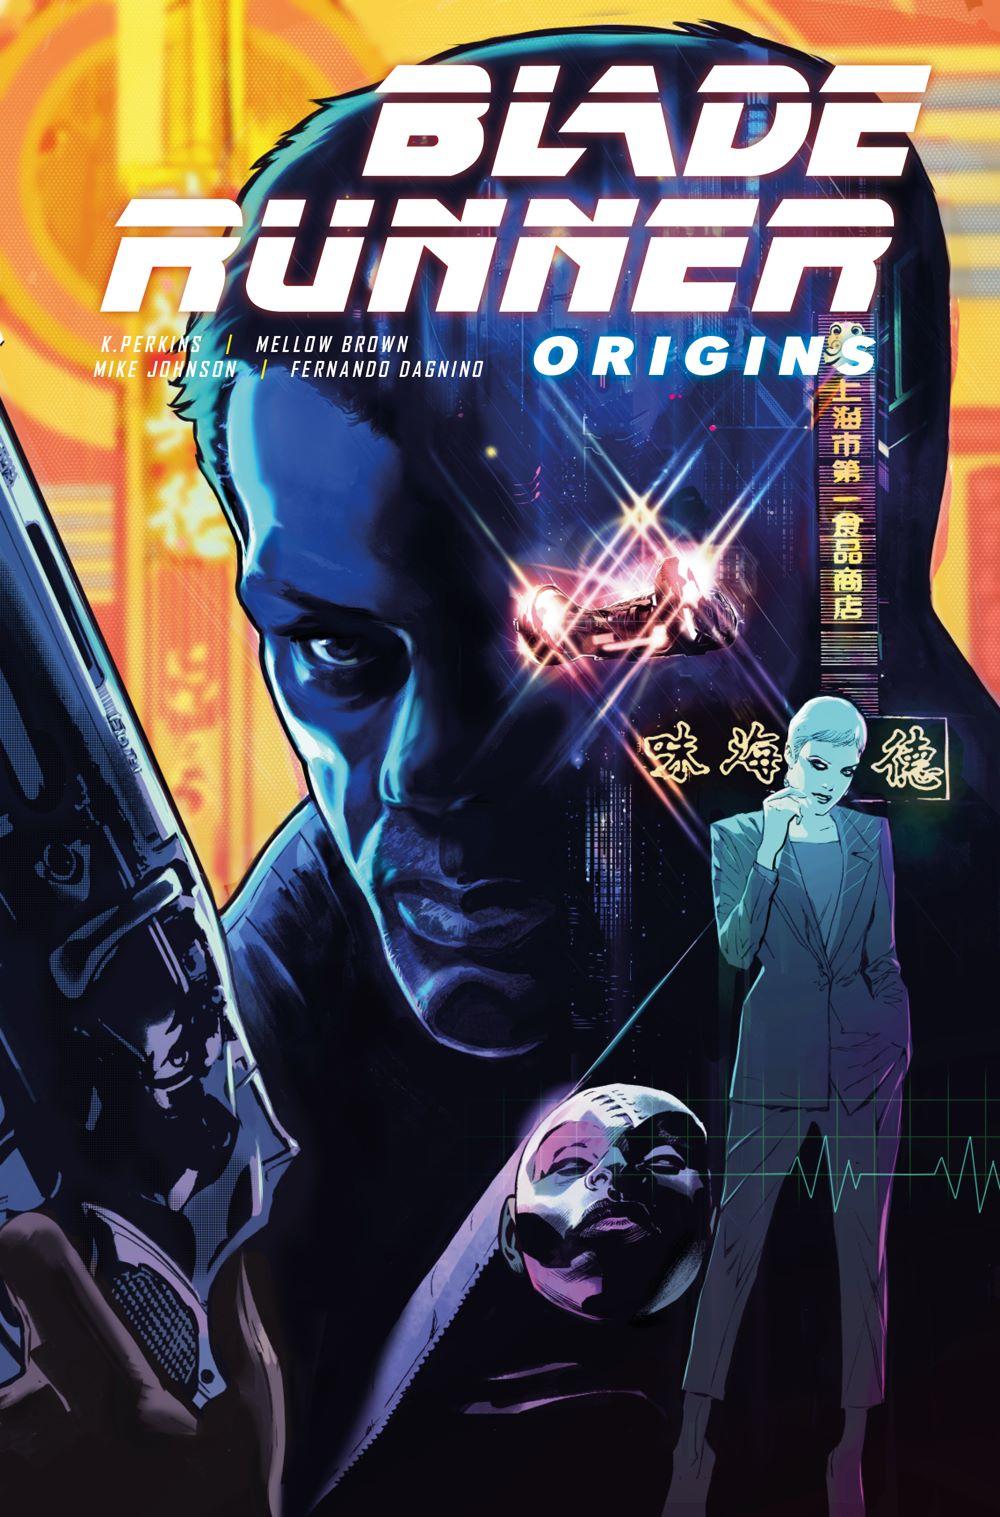 Blade-Runner-Origins_1_C_FERNANDO-DAGNINO ComicList Previews: BLADE RUNNER ORIGINS #1